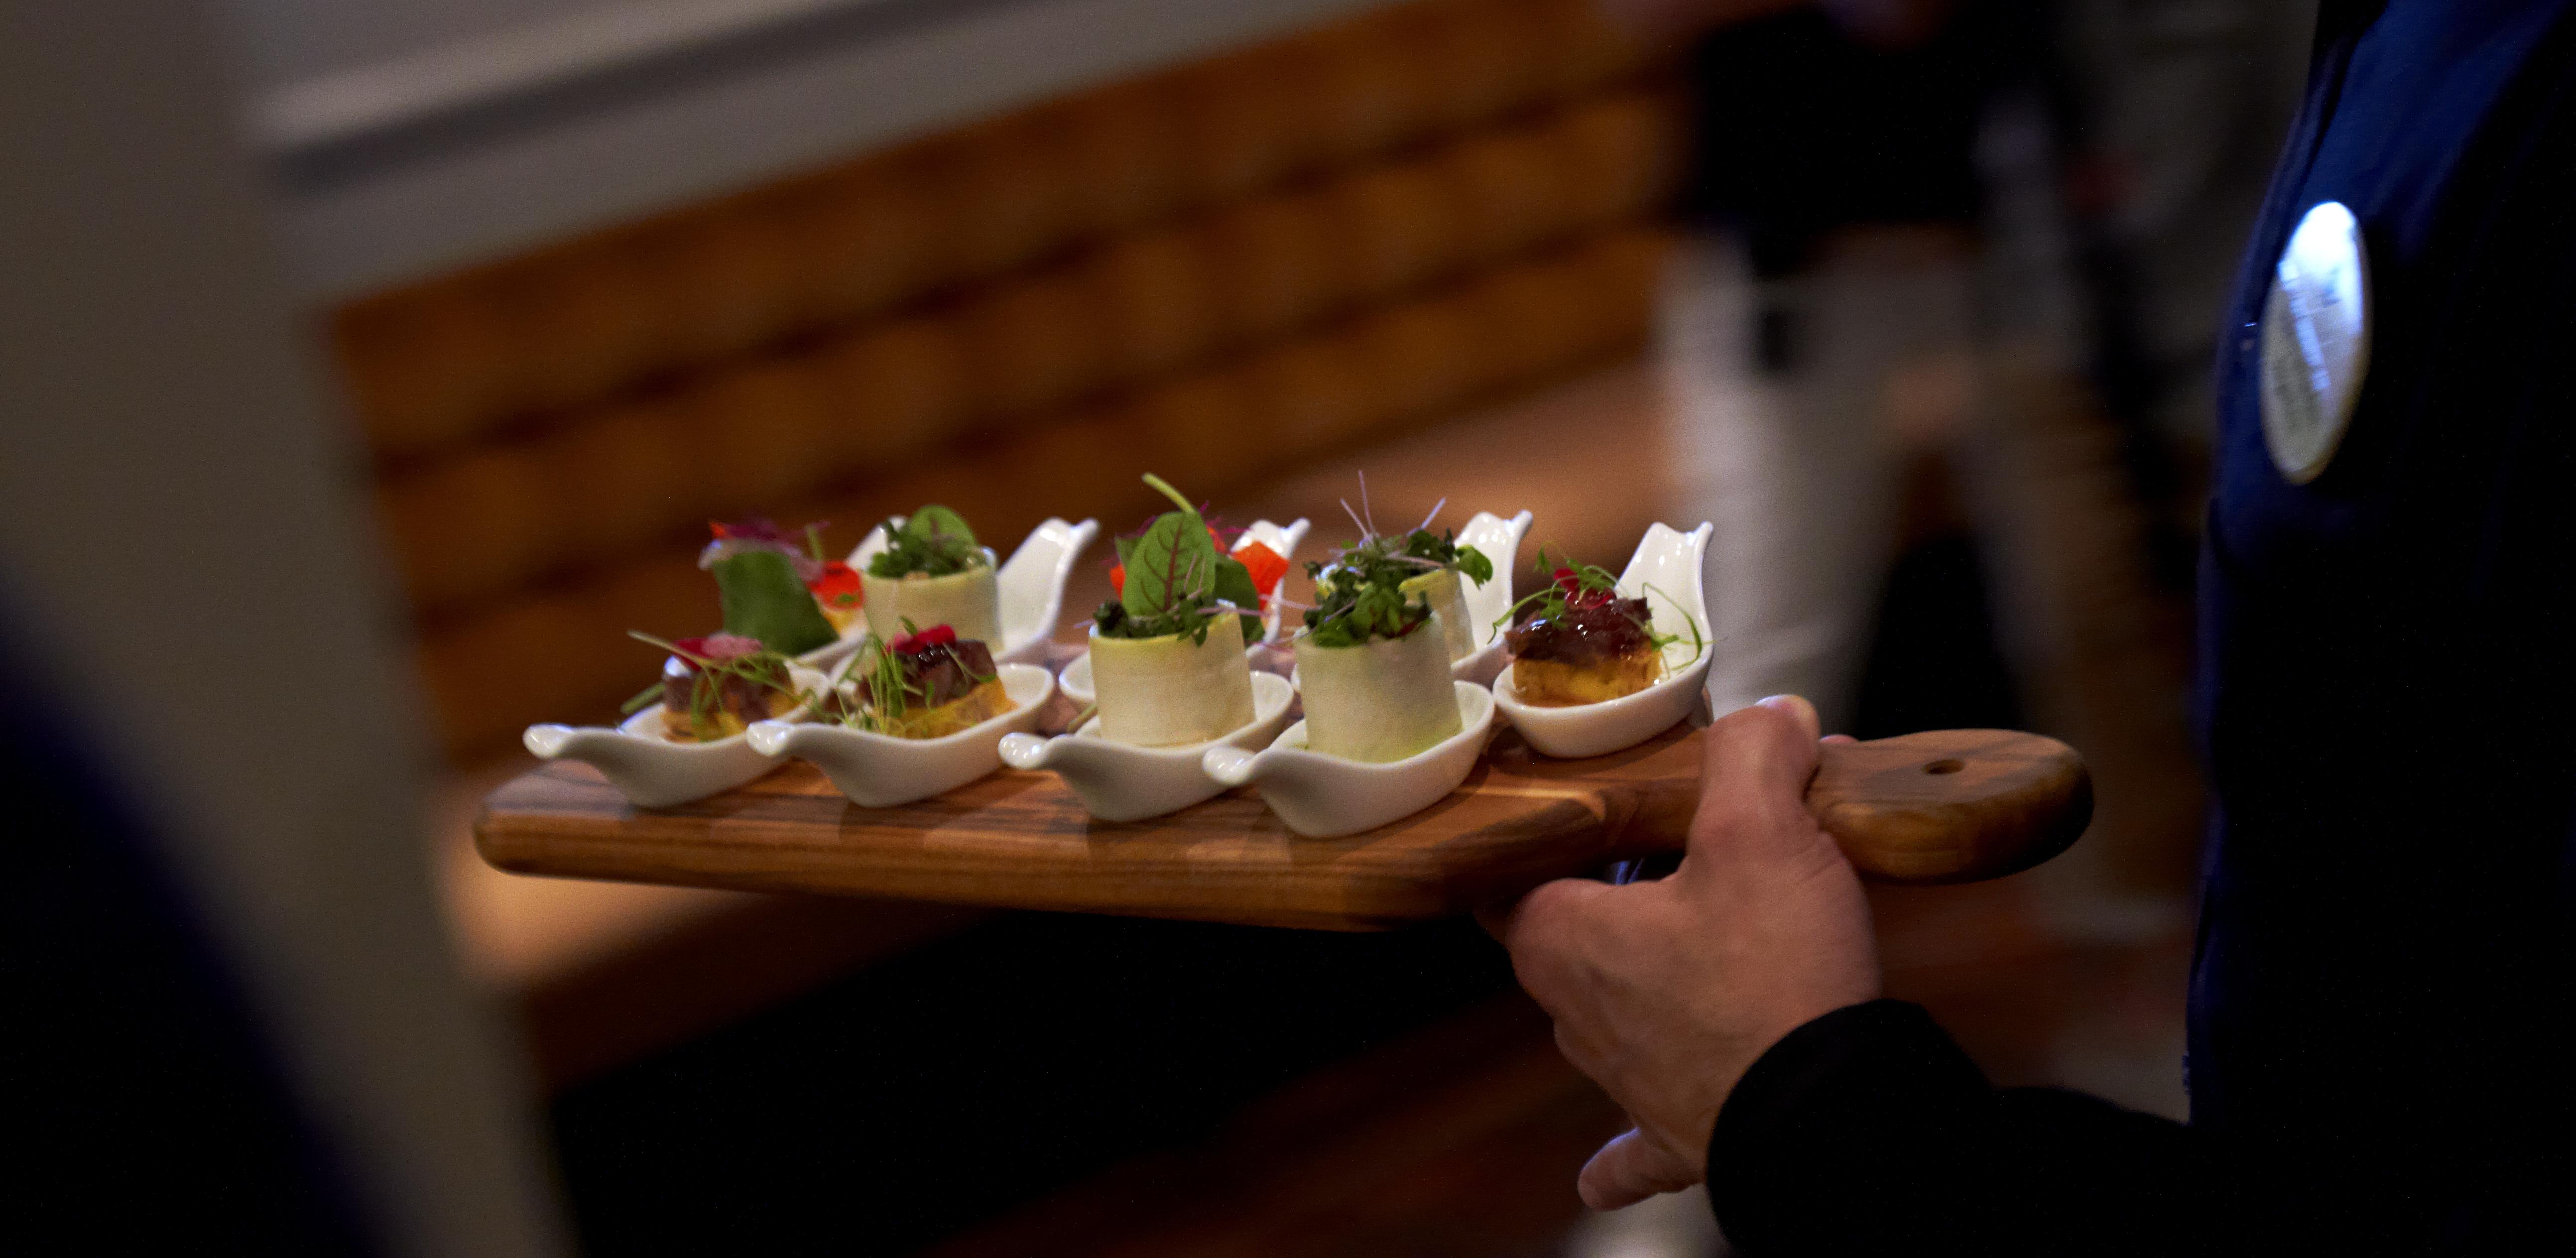 Terrific Upcoming Events At The Gallery Restaurant Ballantyne Hotel Interior Design Ideas Tzicisoteloinfo